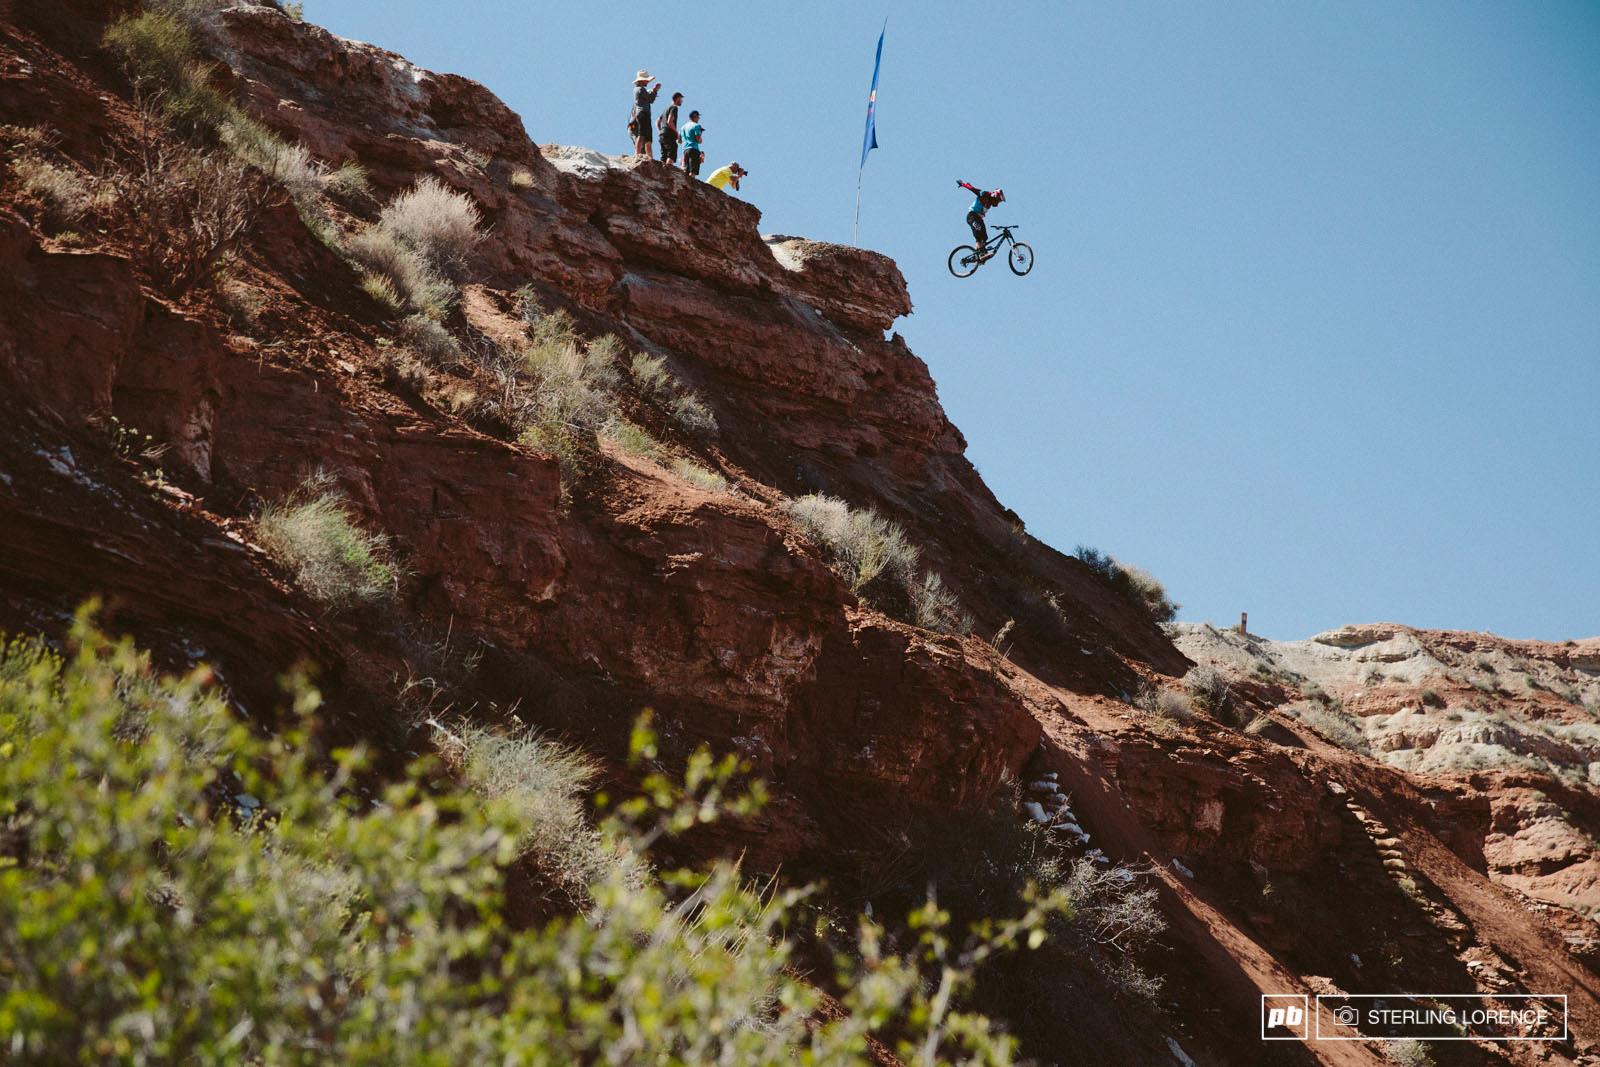 Kyle Strait s no hander drop at RedBull Rampage 2014.